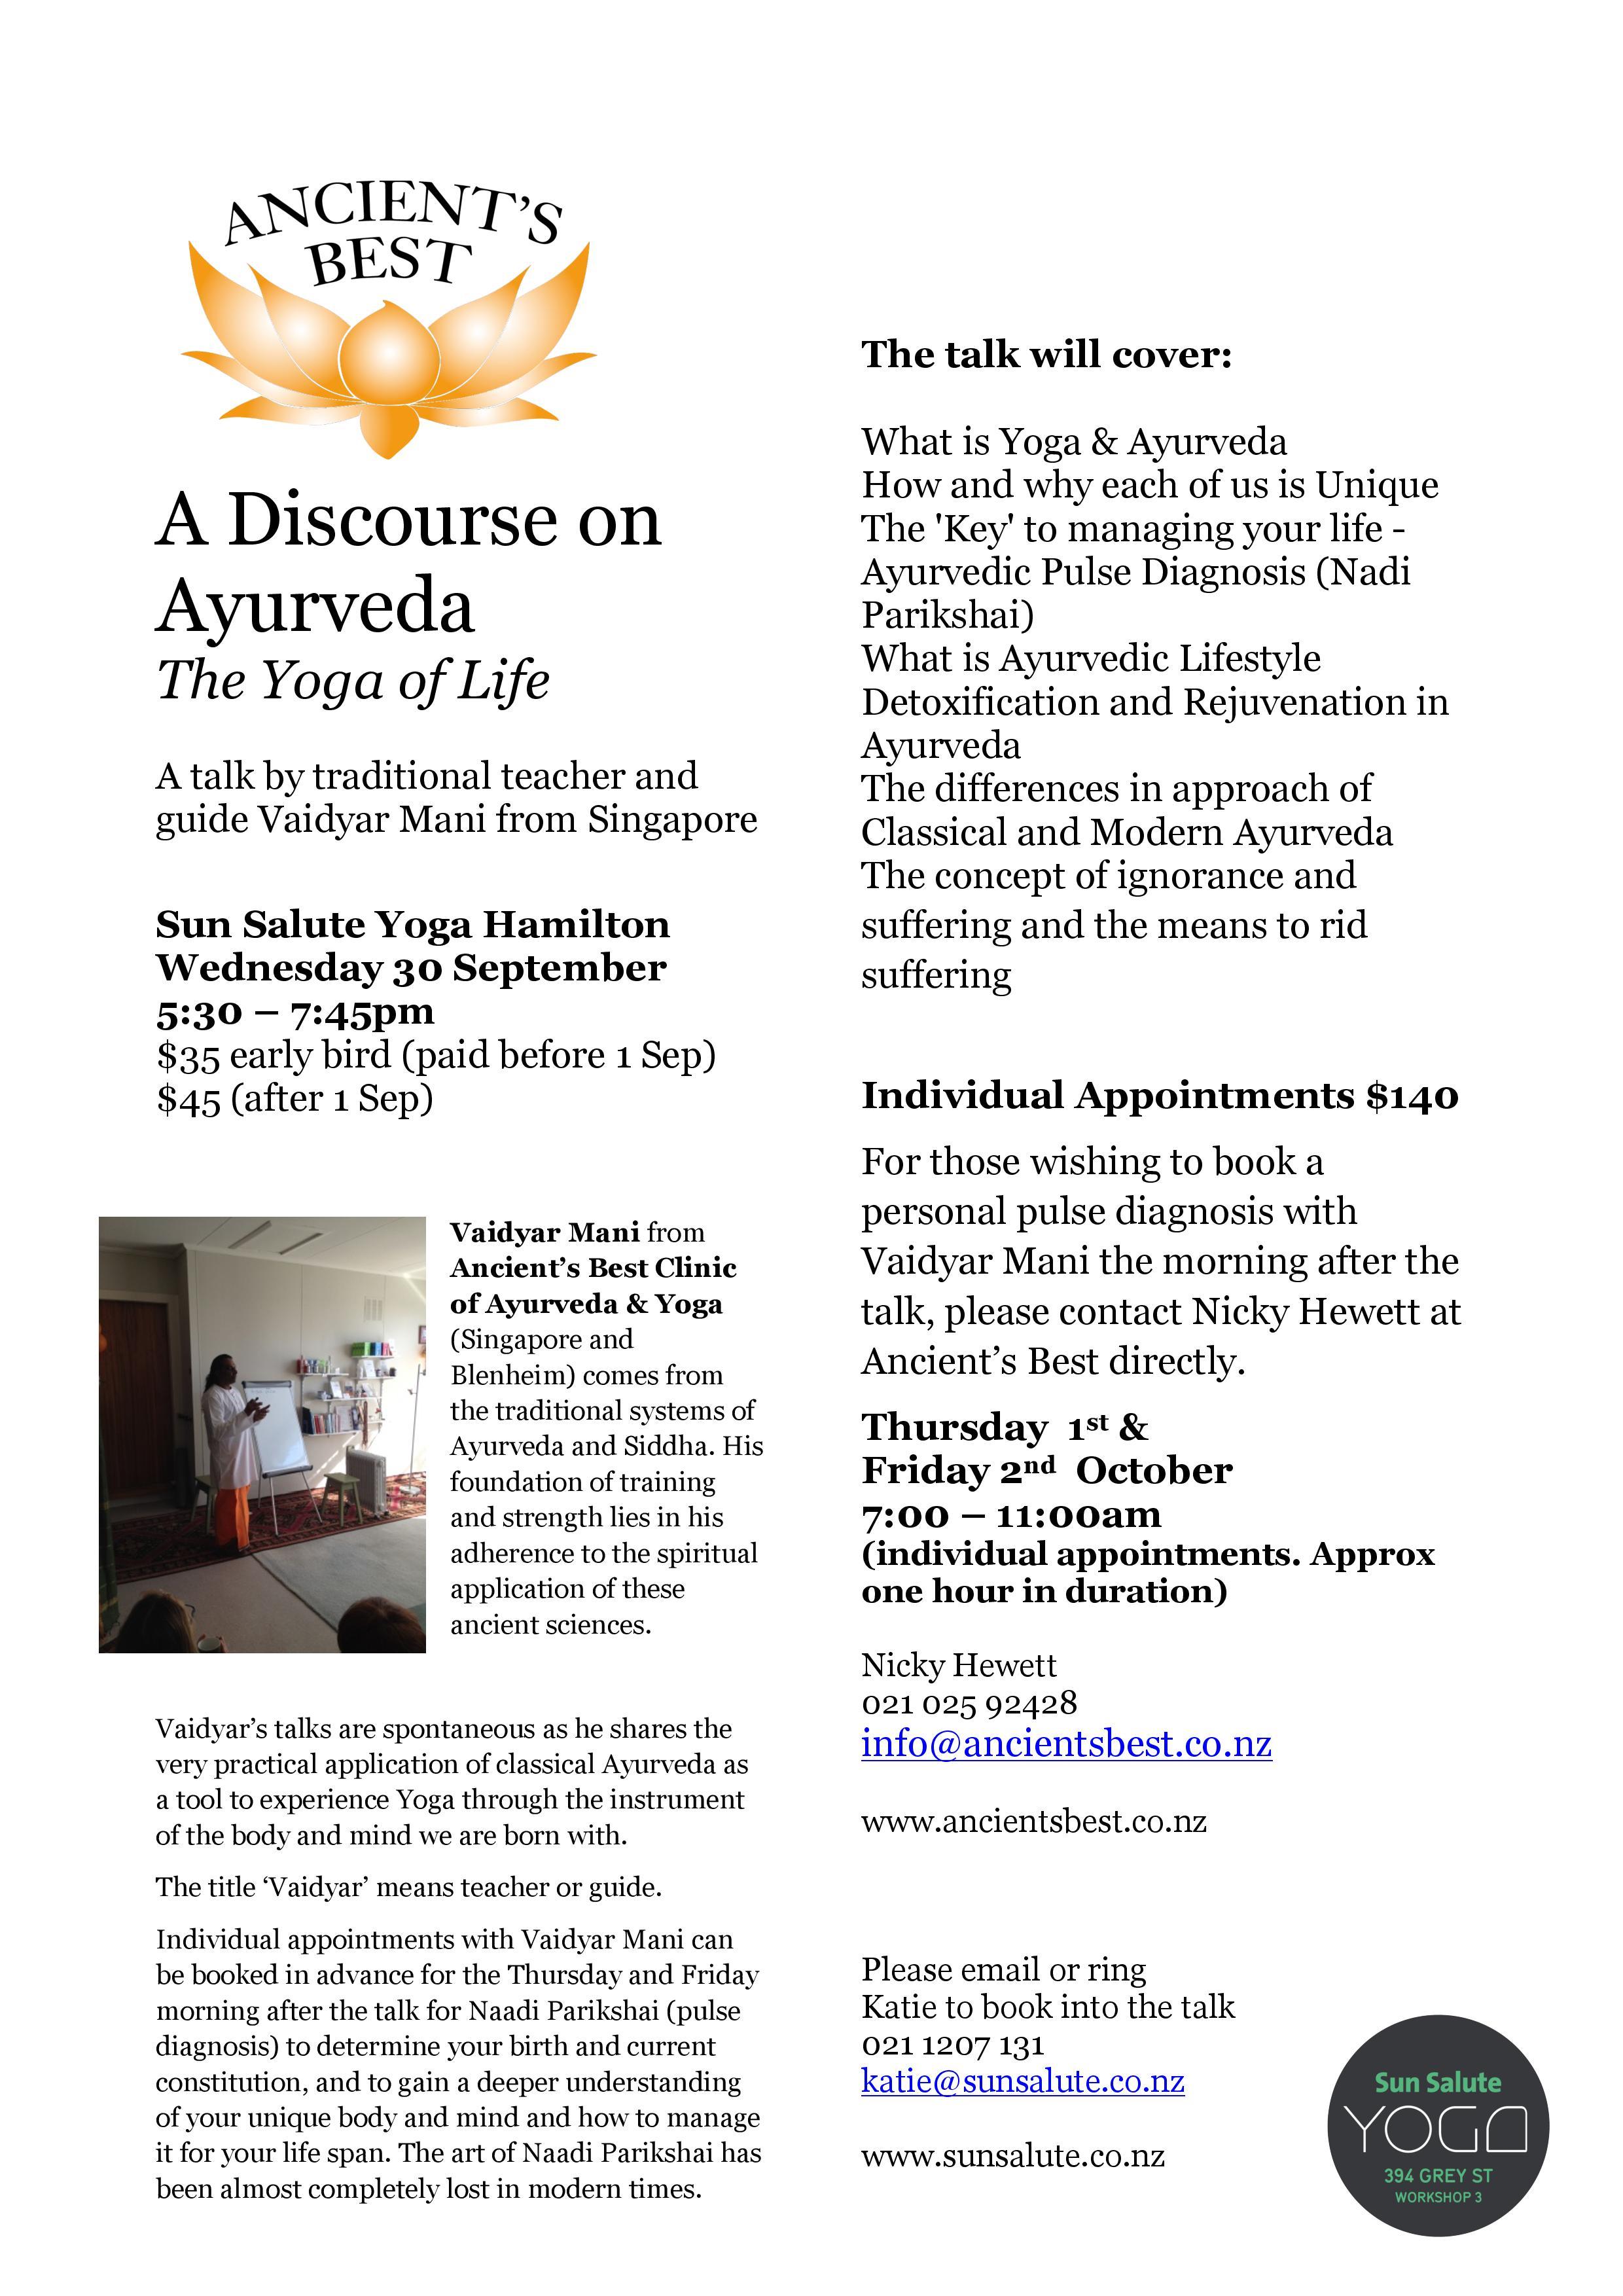 A Discourse on Ayurveda jpeg